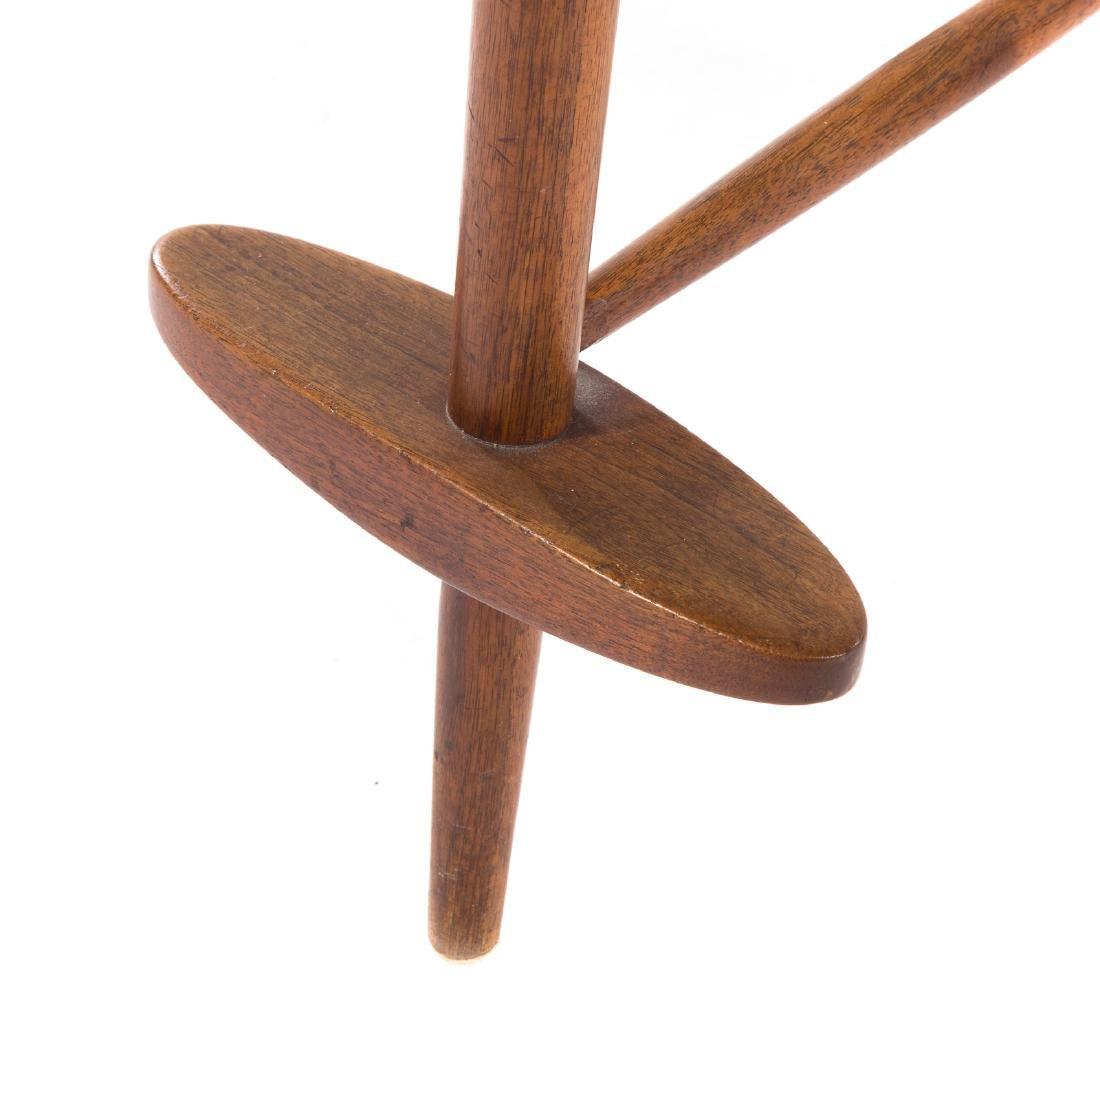 George Nakashima High Mira Chair - 5